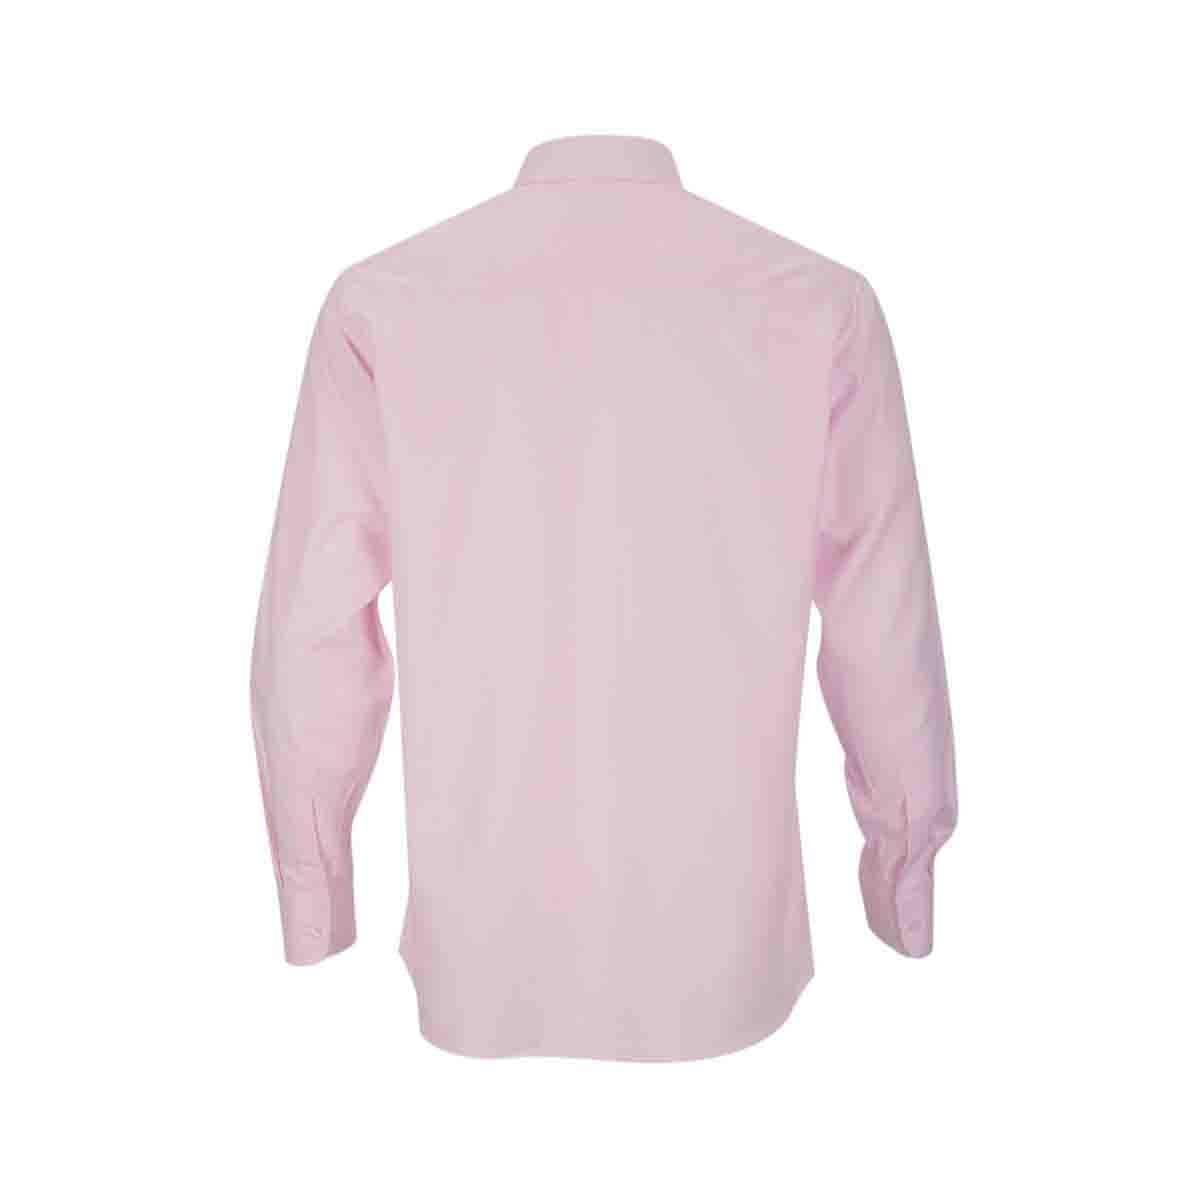 Camisa de Vestir Rosa Claro Bruno Magnani